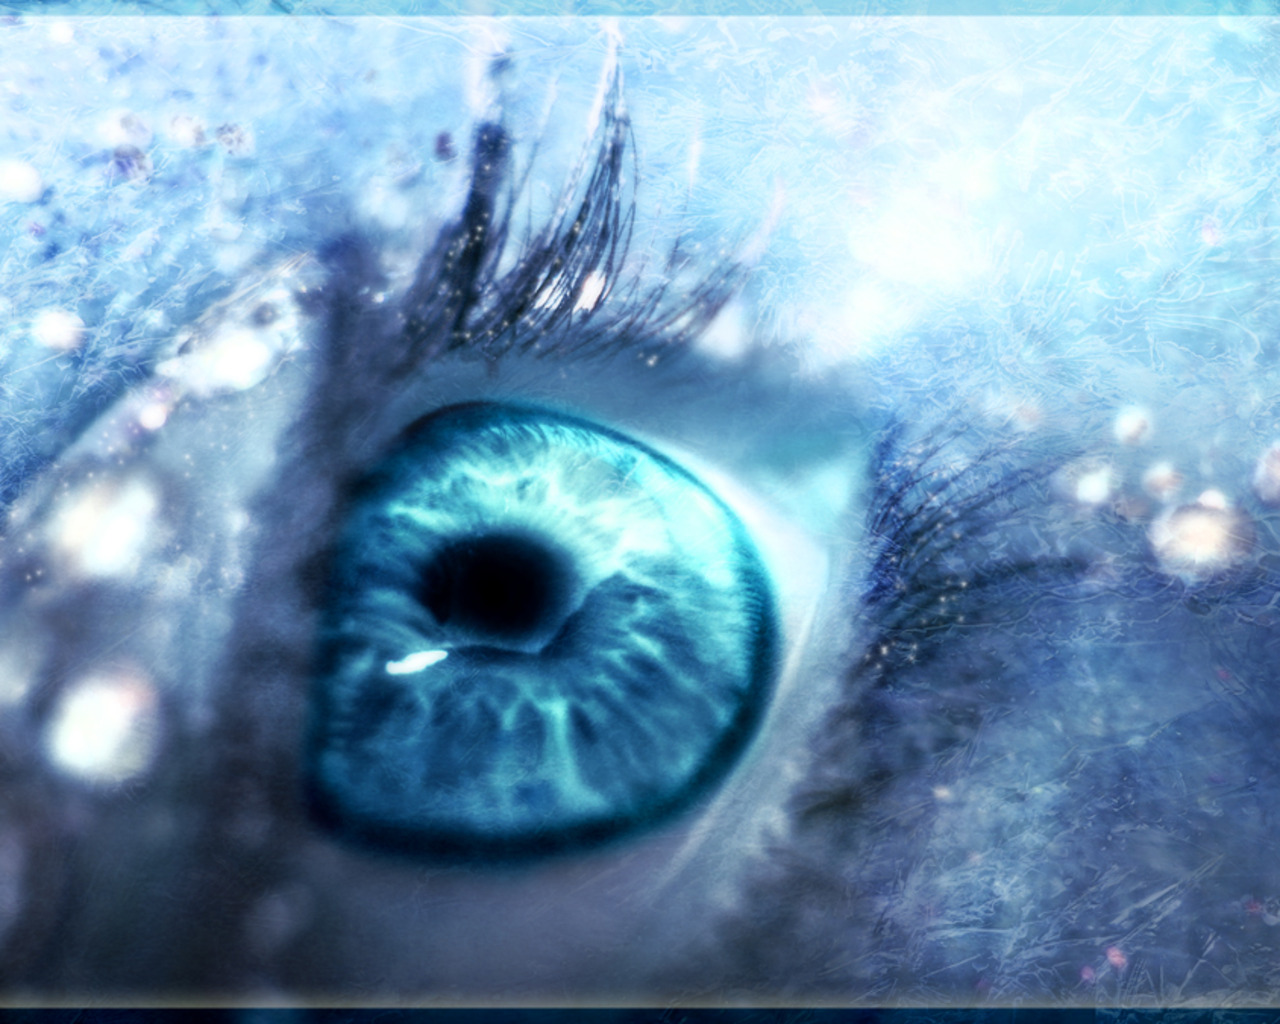 Картинка глаза неба синего